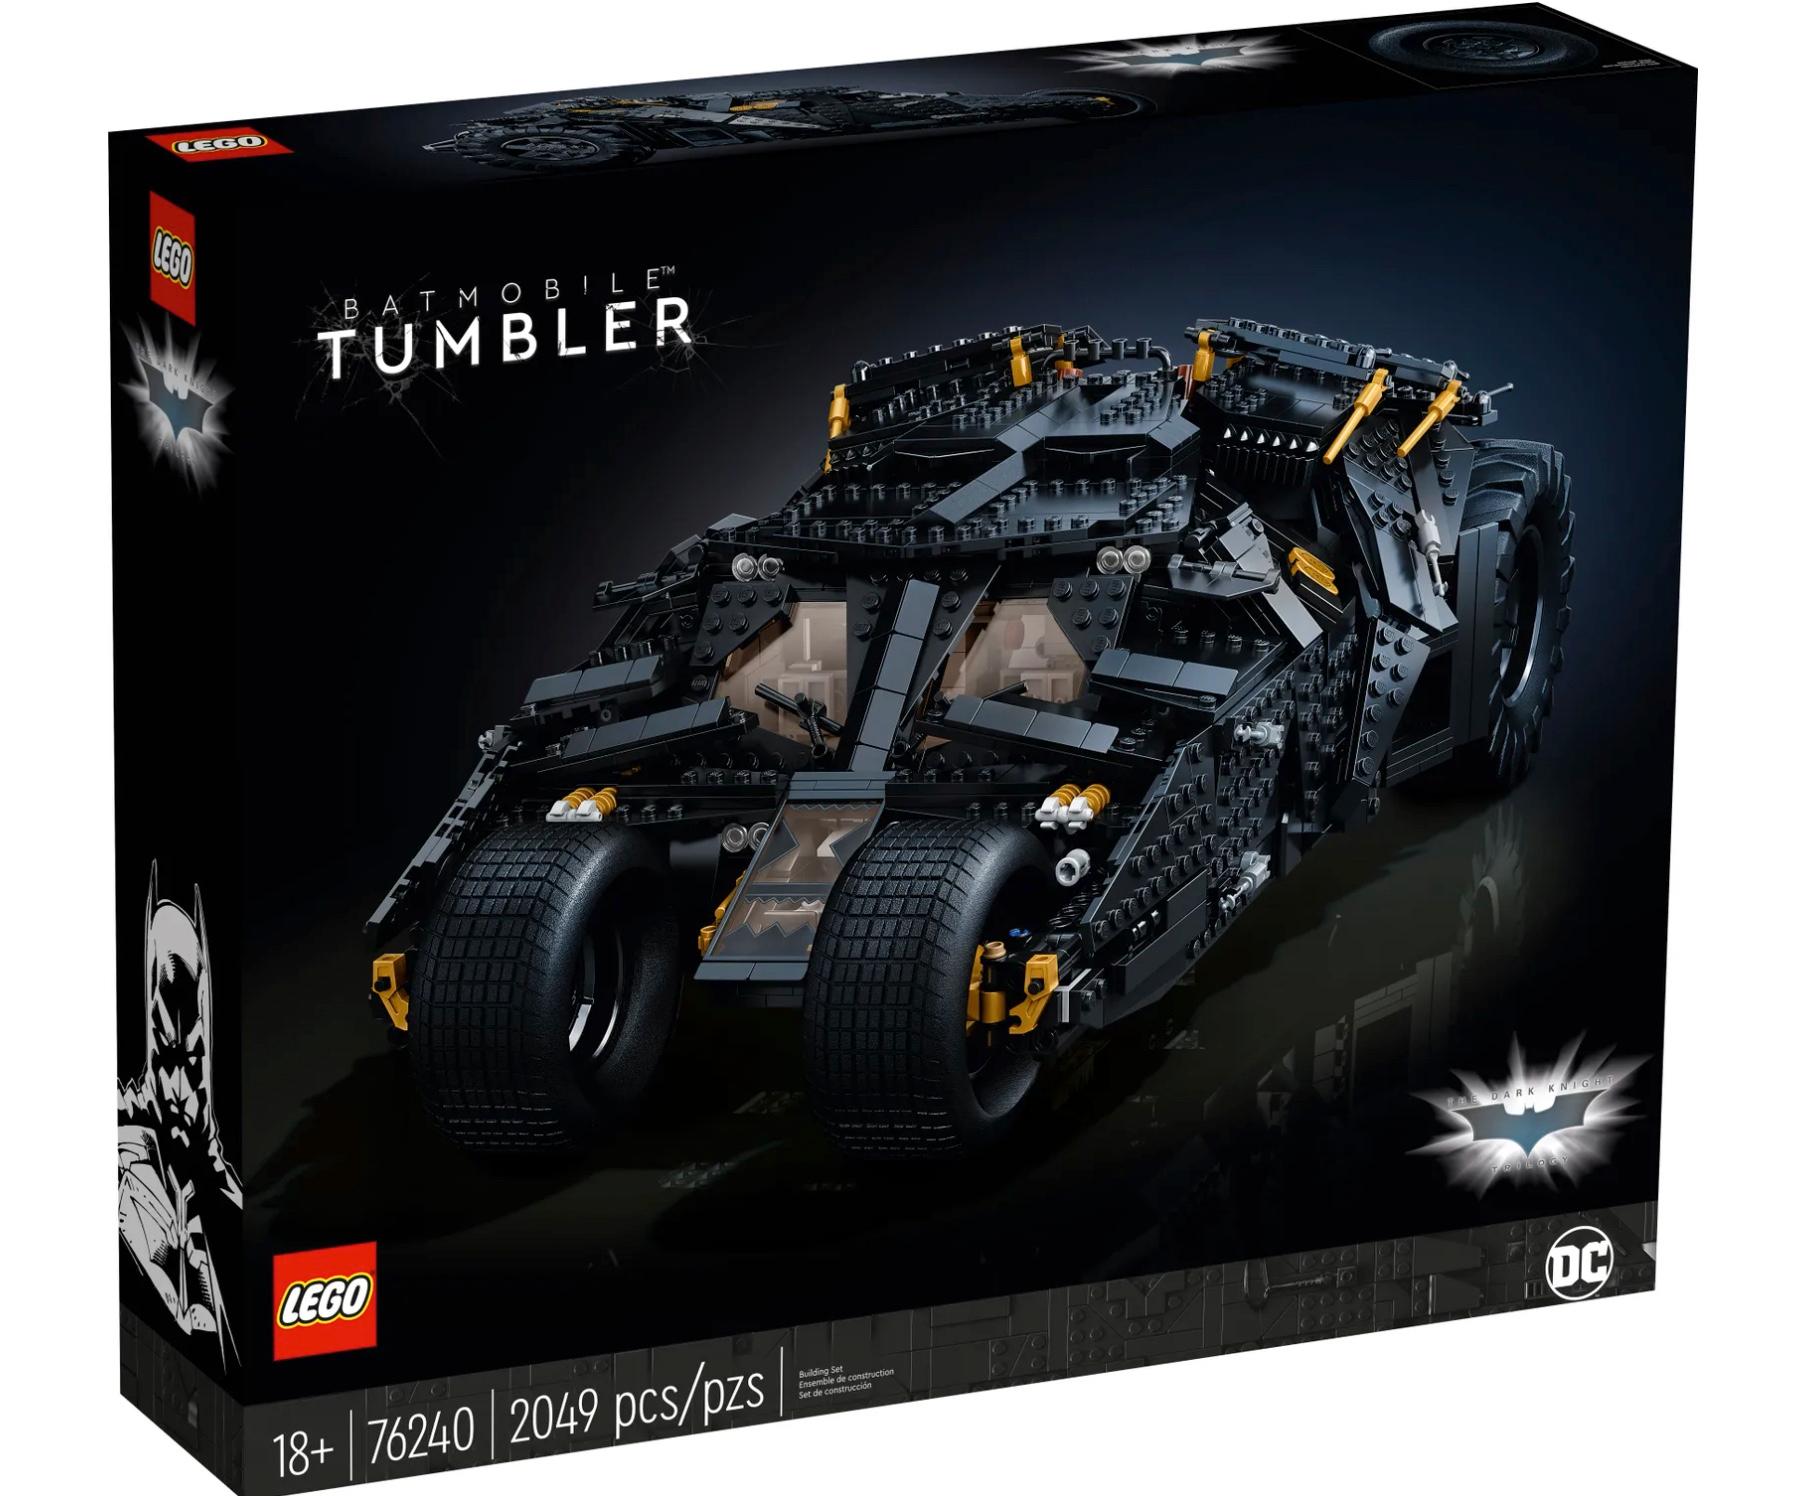 LEGO DC Batmobile Tumbler